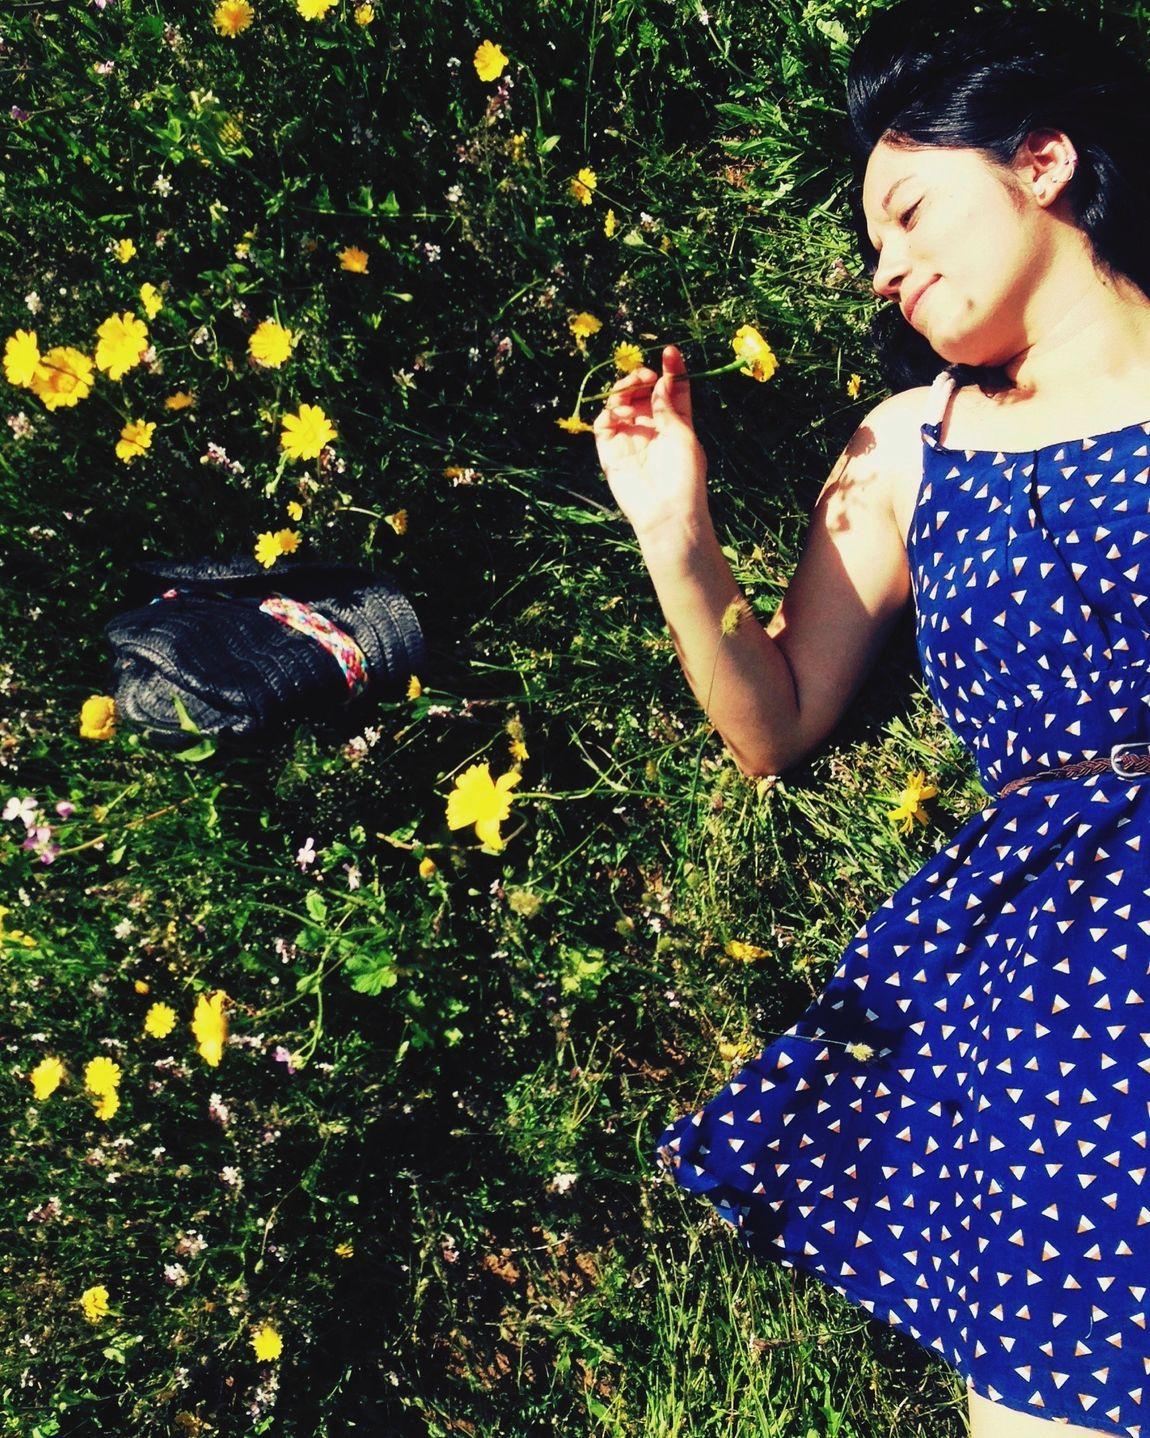 Kiss my soul 💕 Hi! Summer Naturelovers South Of Chile EyeEm Nature Lover Chile Free Nature Eyemphotography Landscape_Collection Peace ✌ Beautiful Nature Meditation Moments Keep_calm Puravida Enjoying Fresh Air El Mejor Lugar Del Mundo